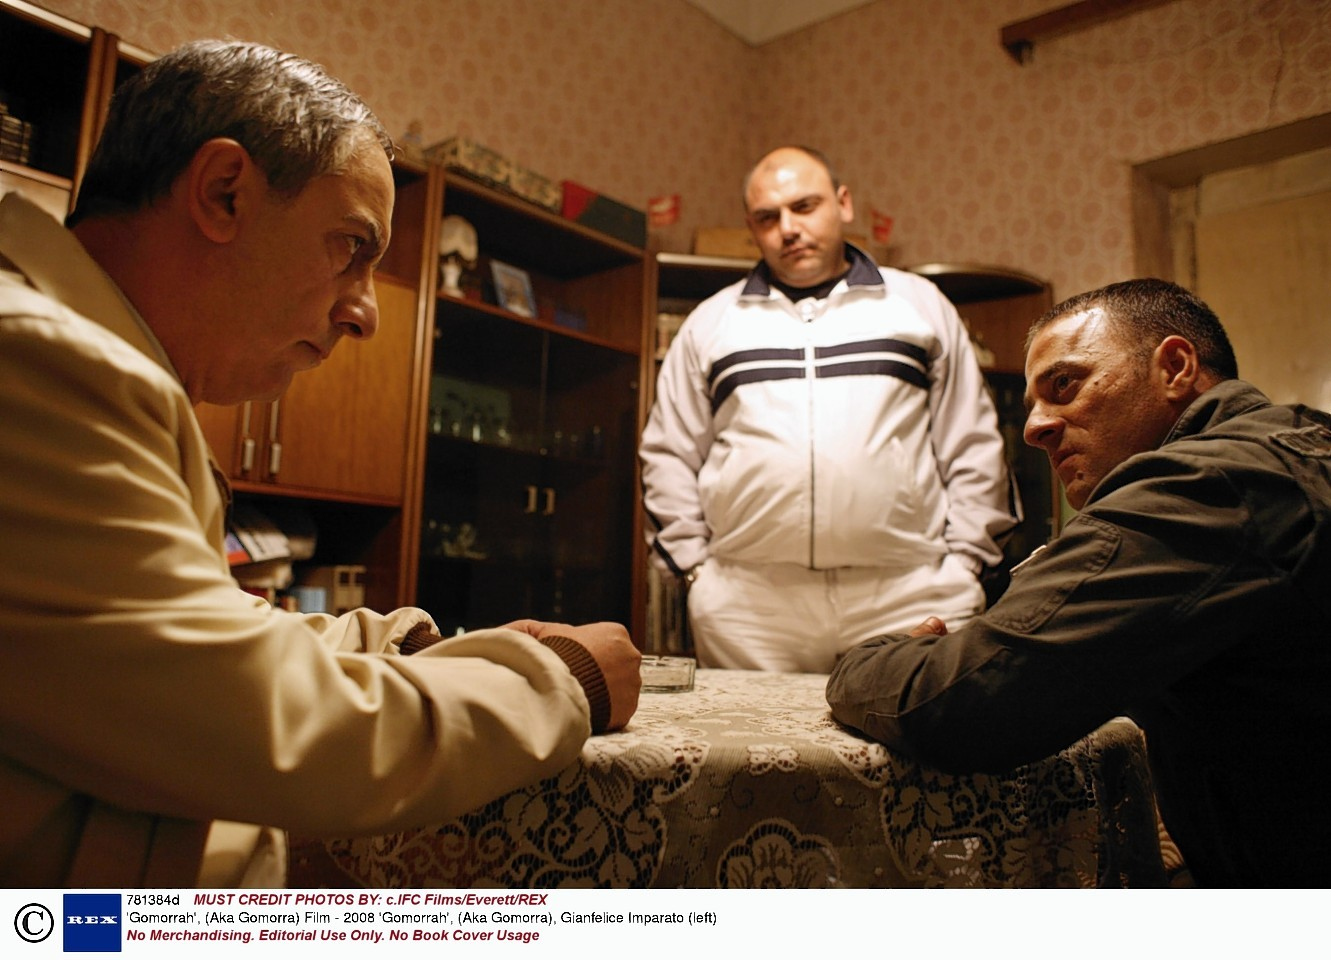 Mafia film Gomorrah